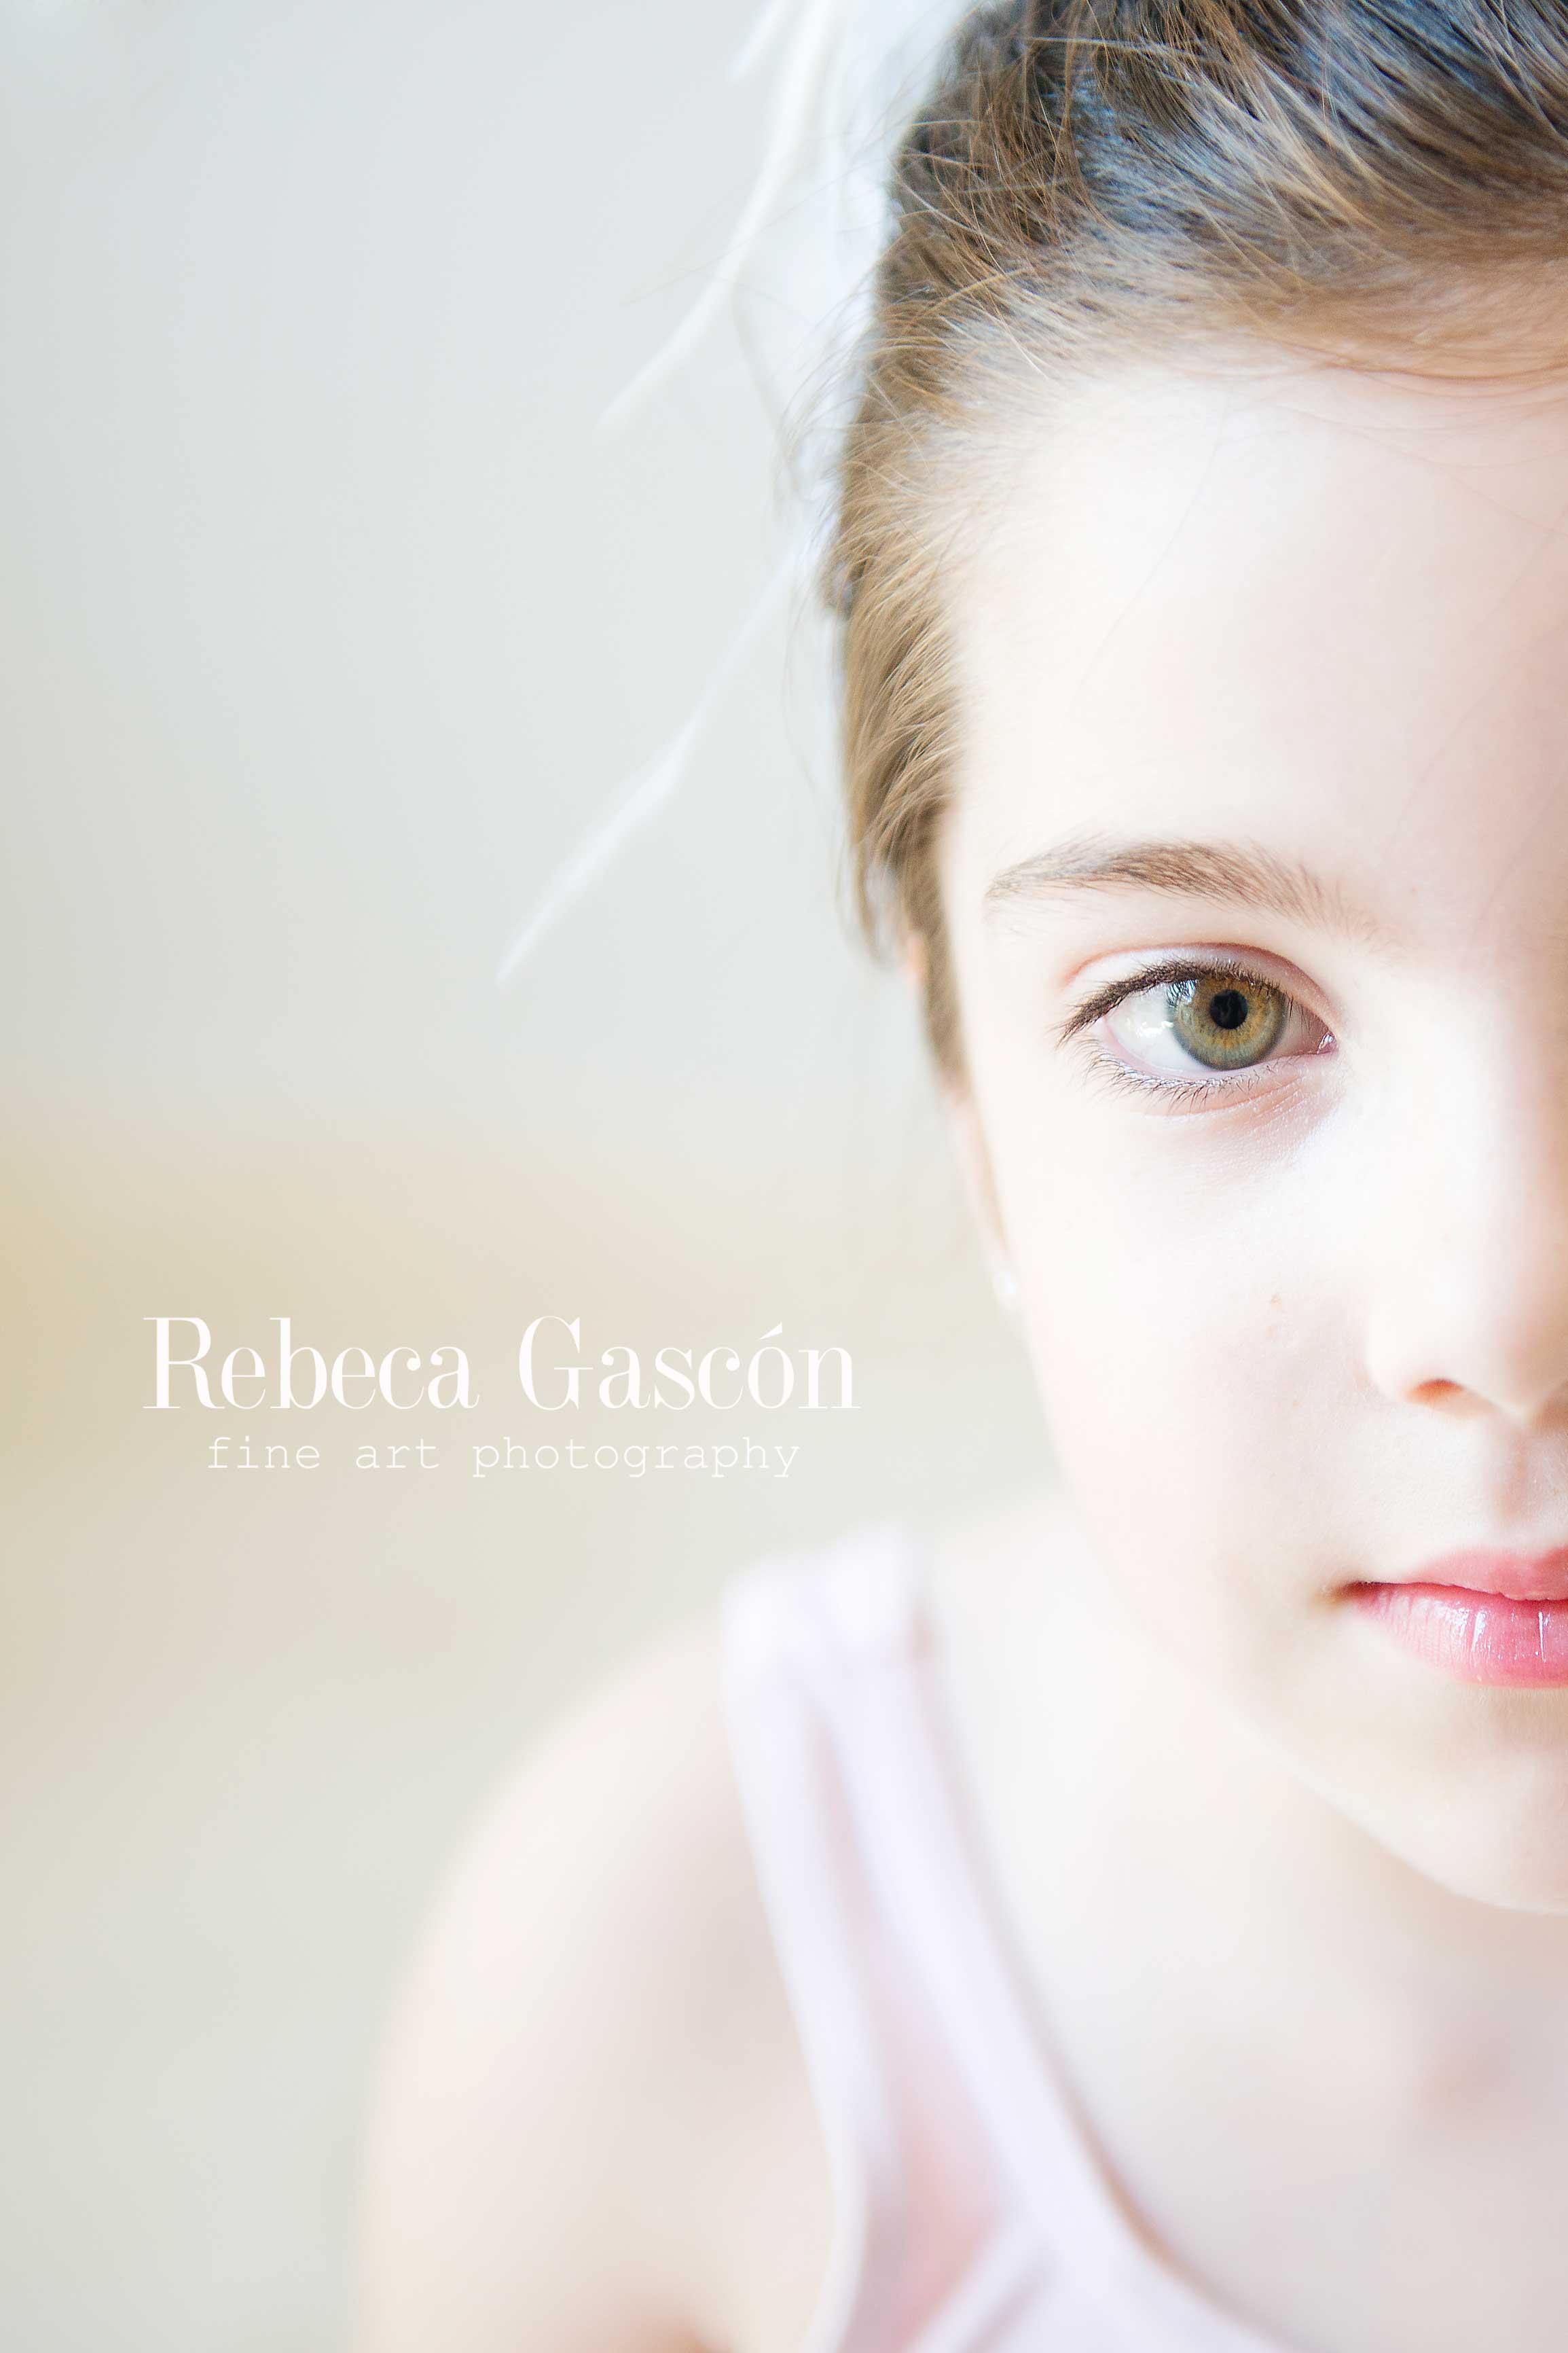 rebeca-gascon-fotografa-infantil